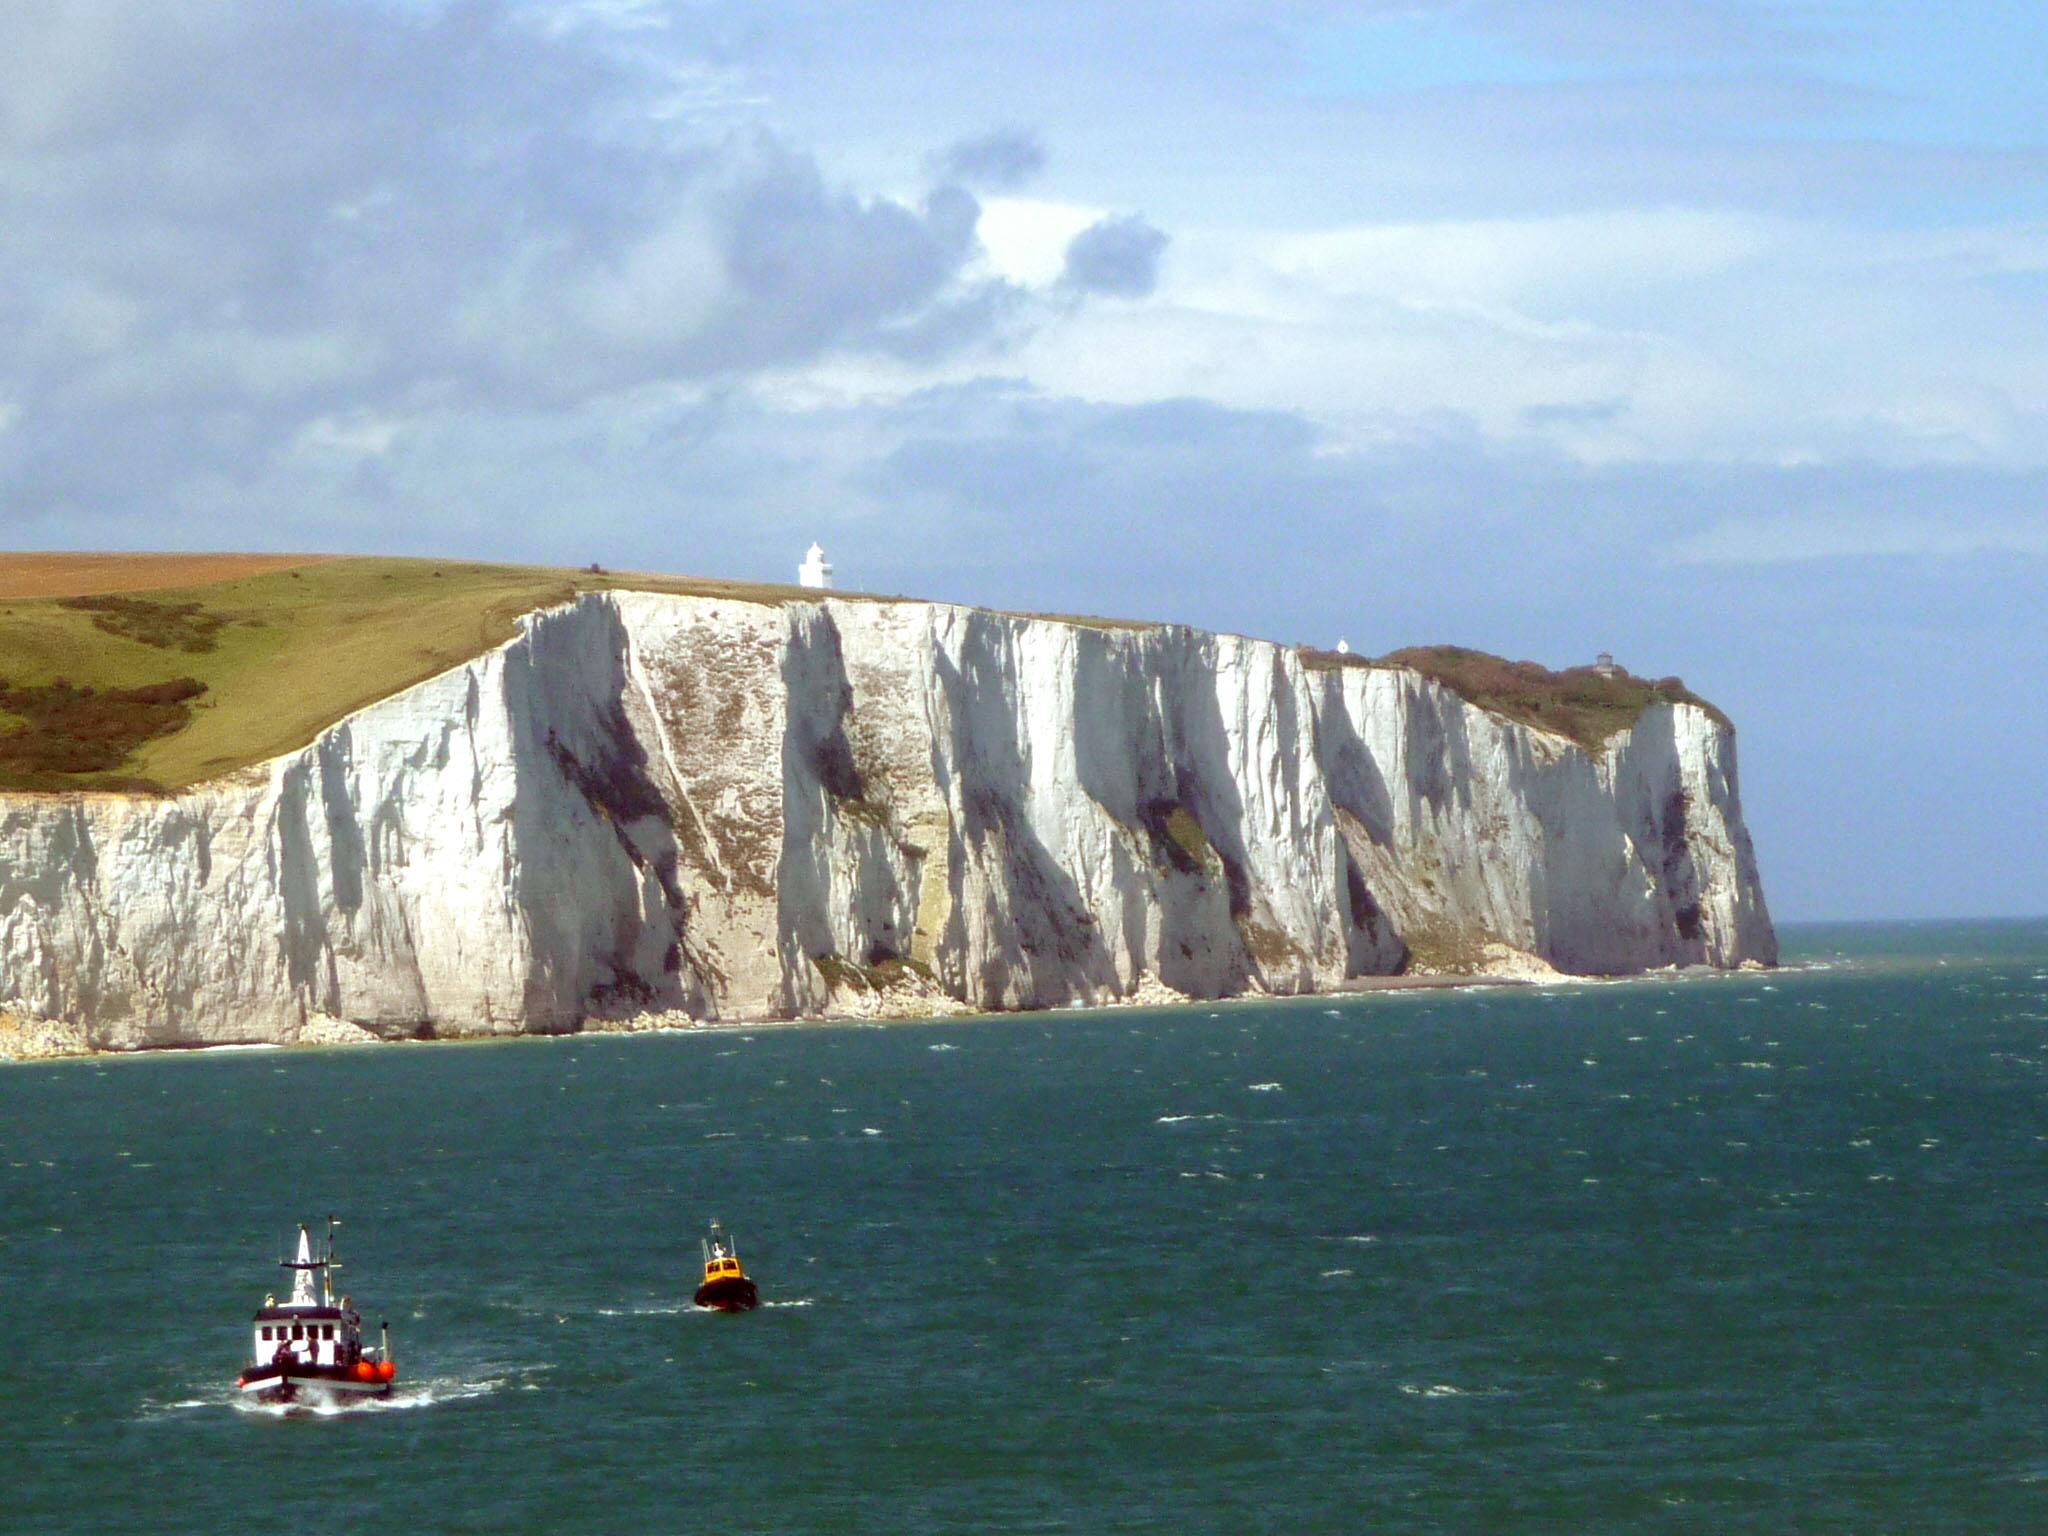 Dover image png freeuse download Giant algal bloom sheds light on formation of White Cliffs of Dover png freeuse download